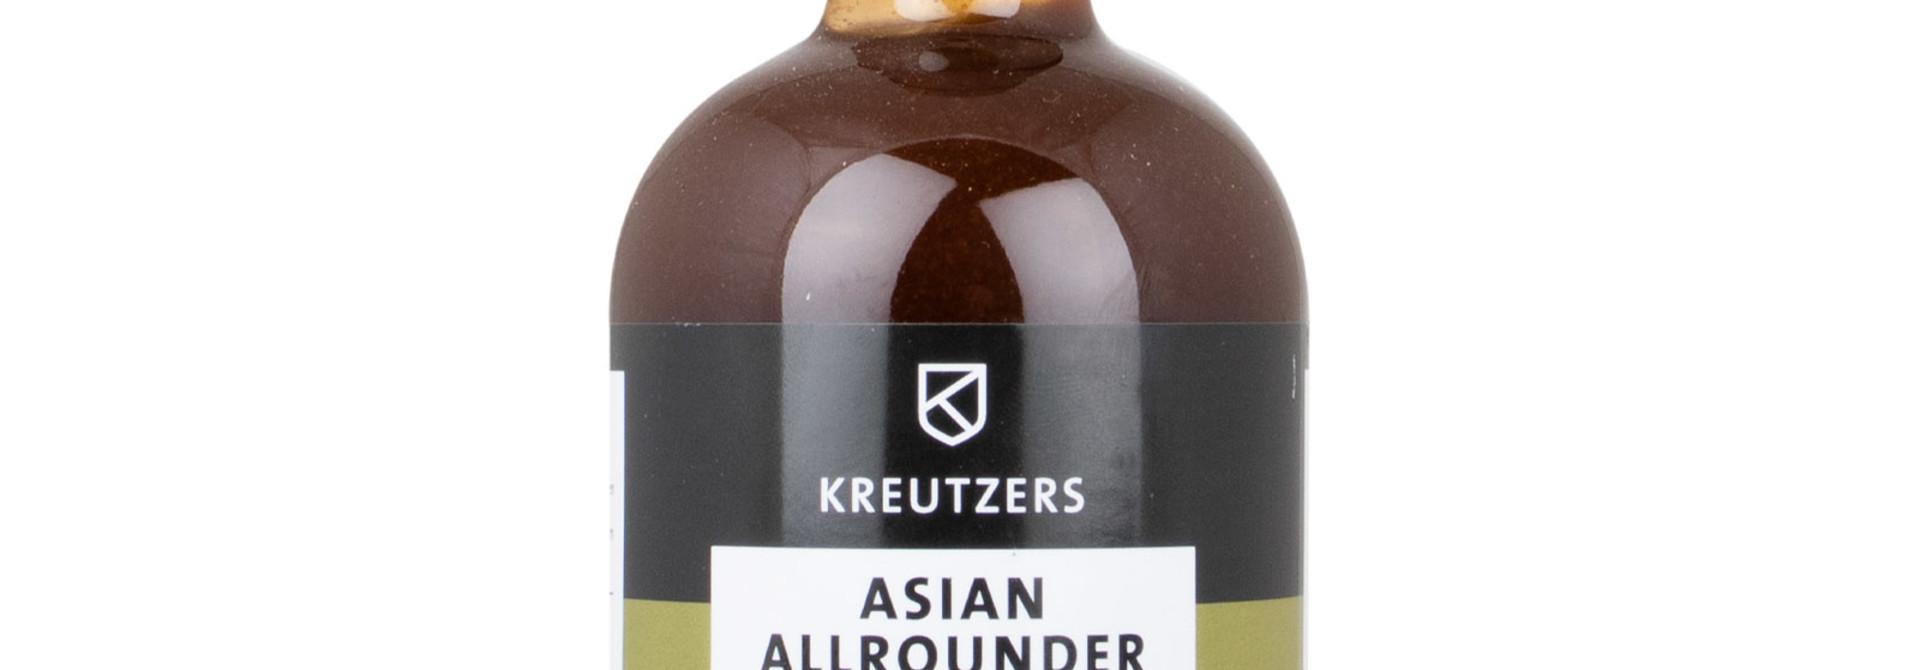 Saus.Guru X Kreutzers - Asian Allrounder